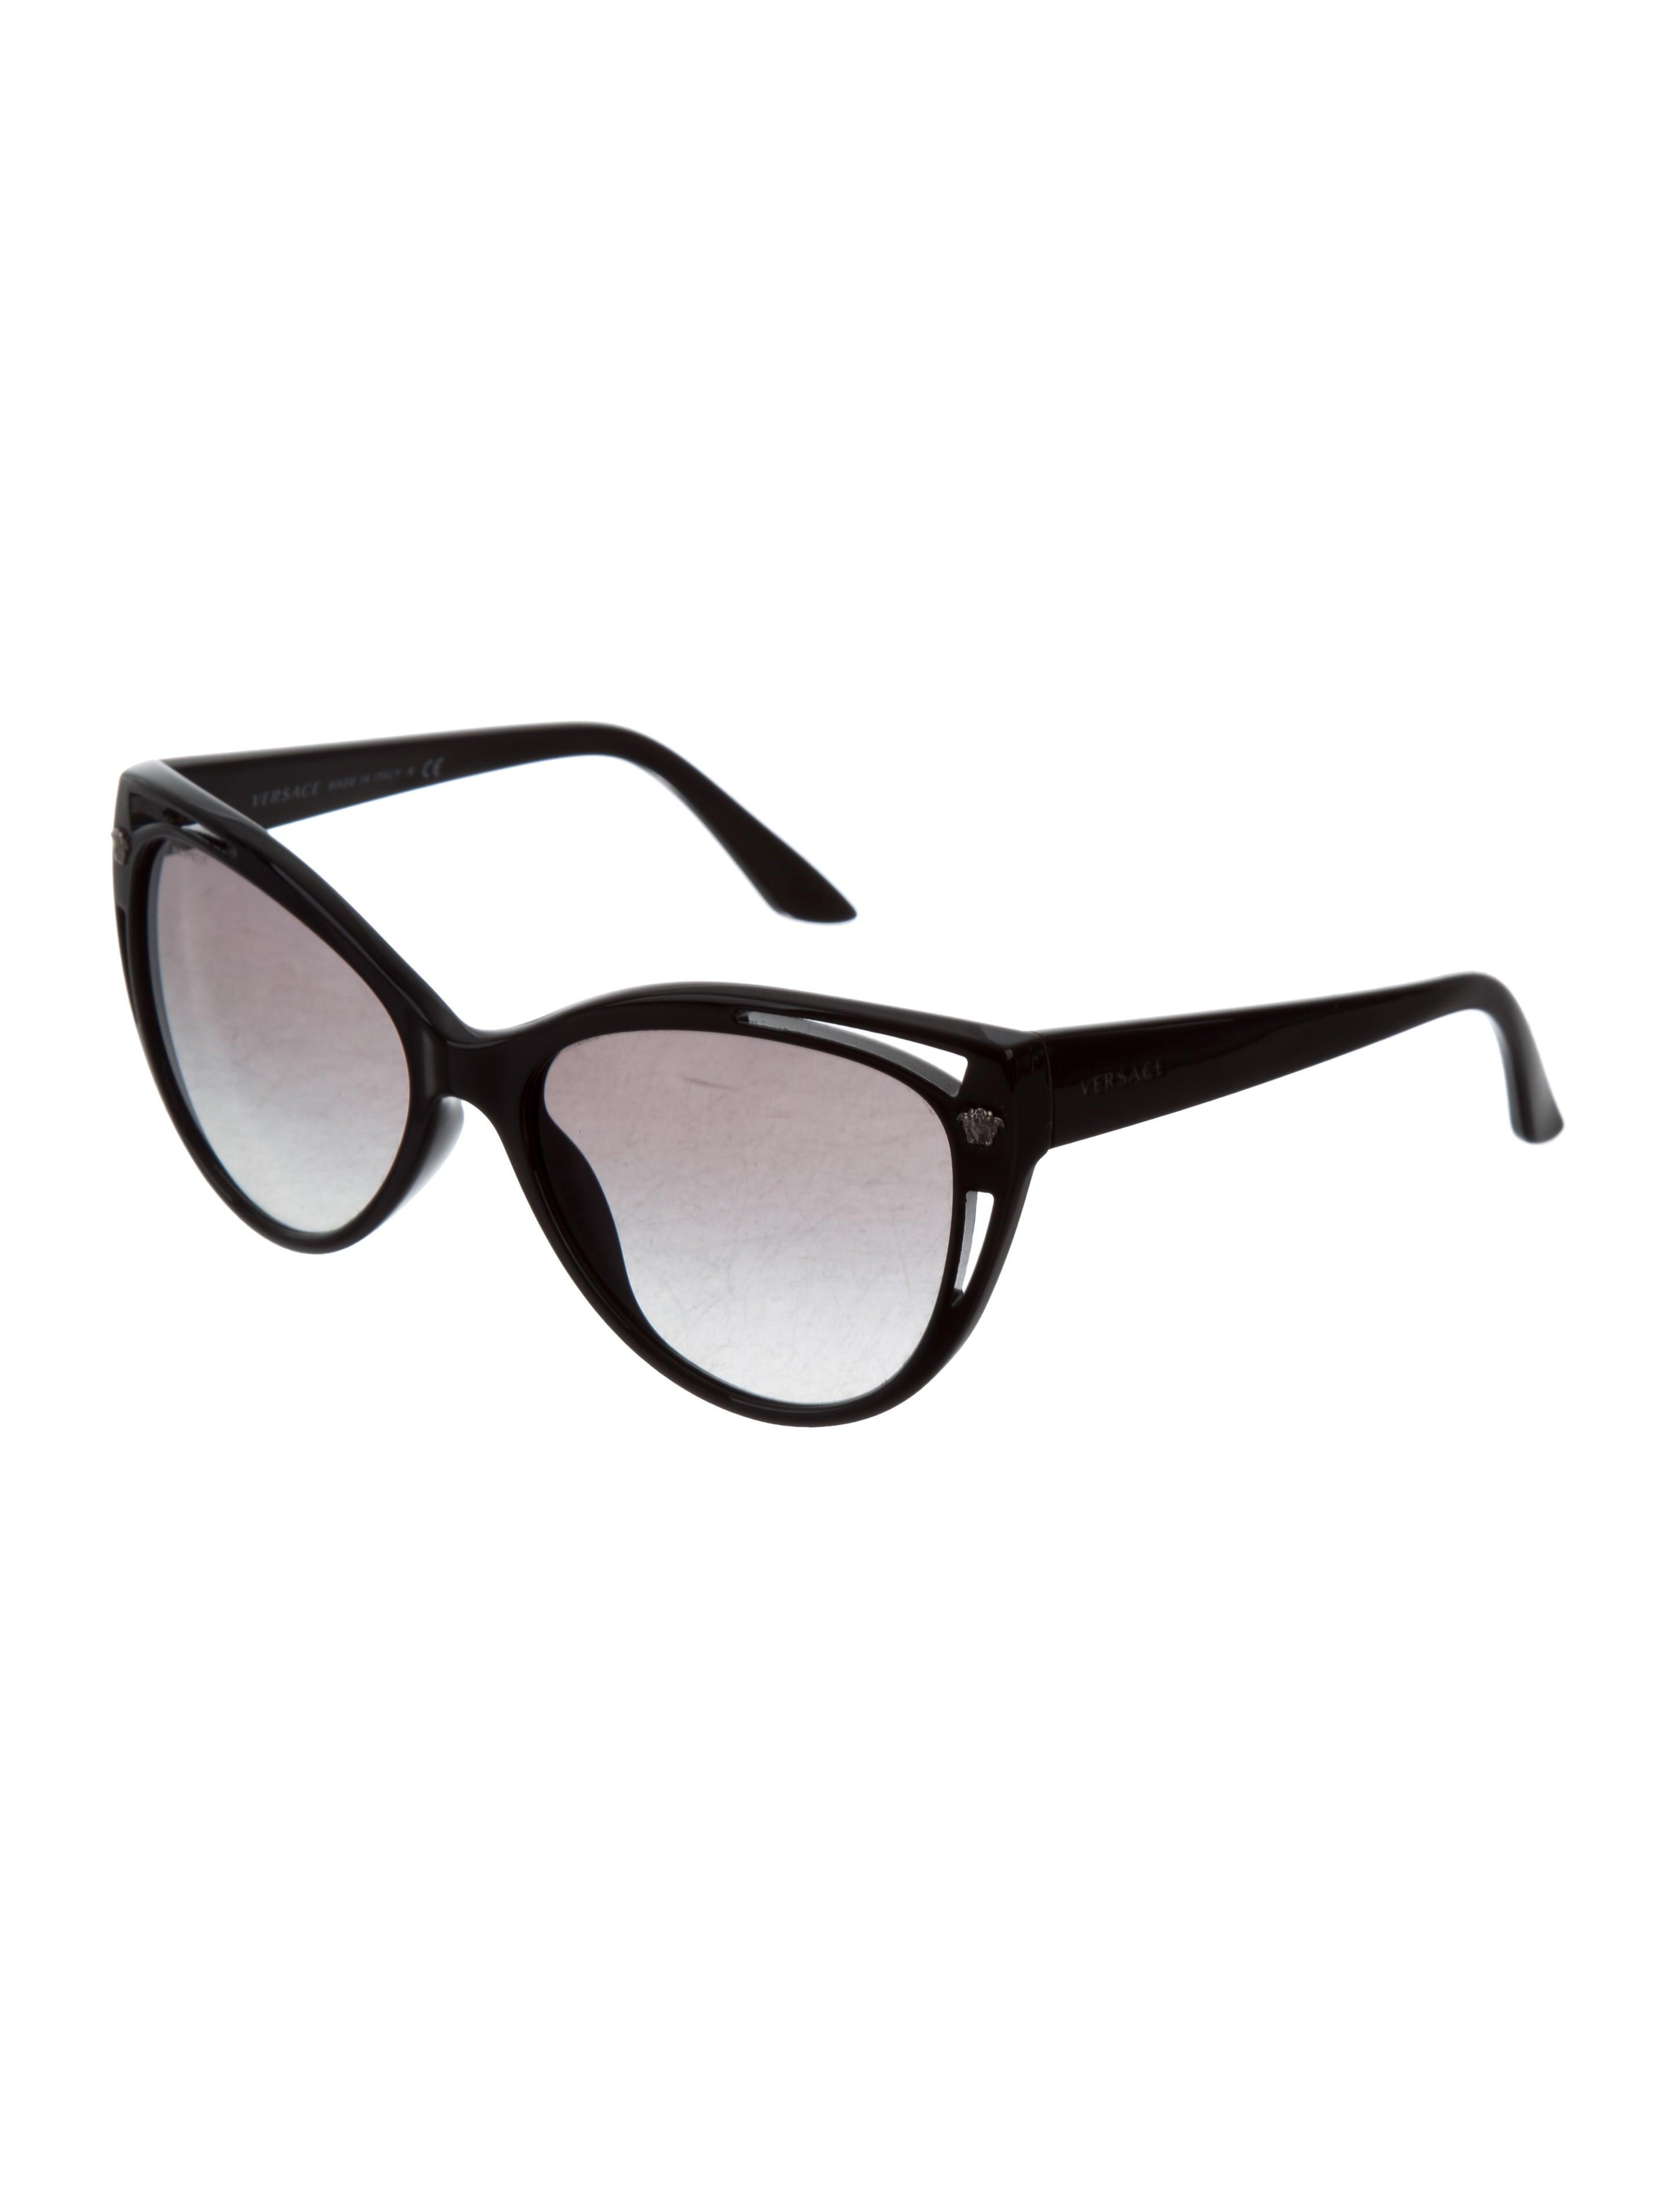 495f3b8af1aa Versace Cat Eye Sunglasses With Medusa Detail